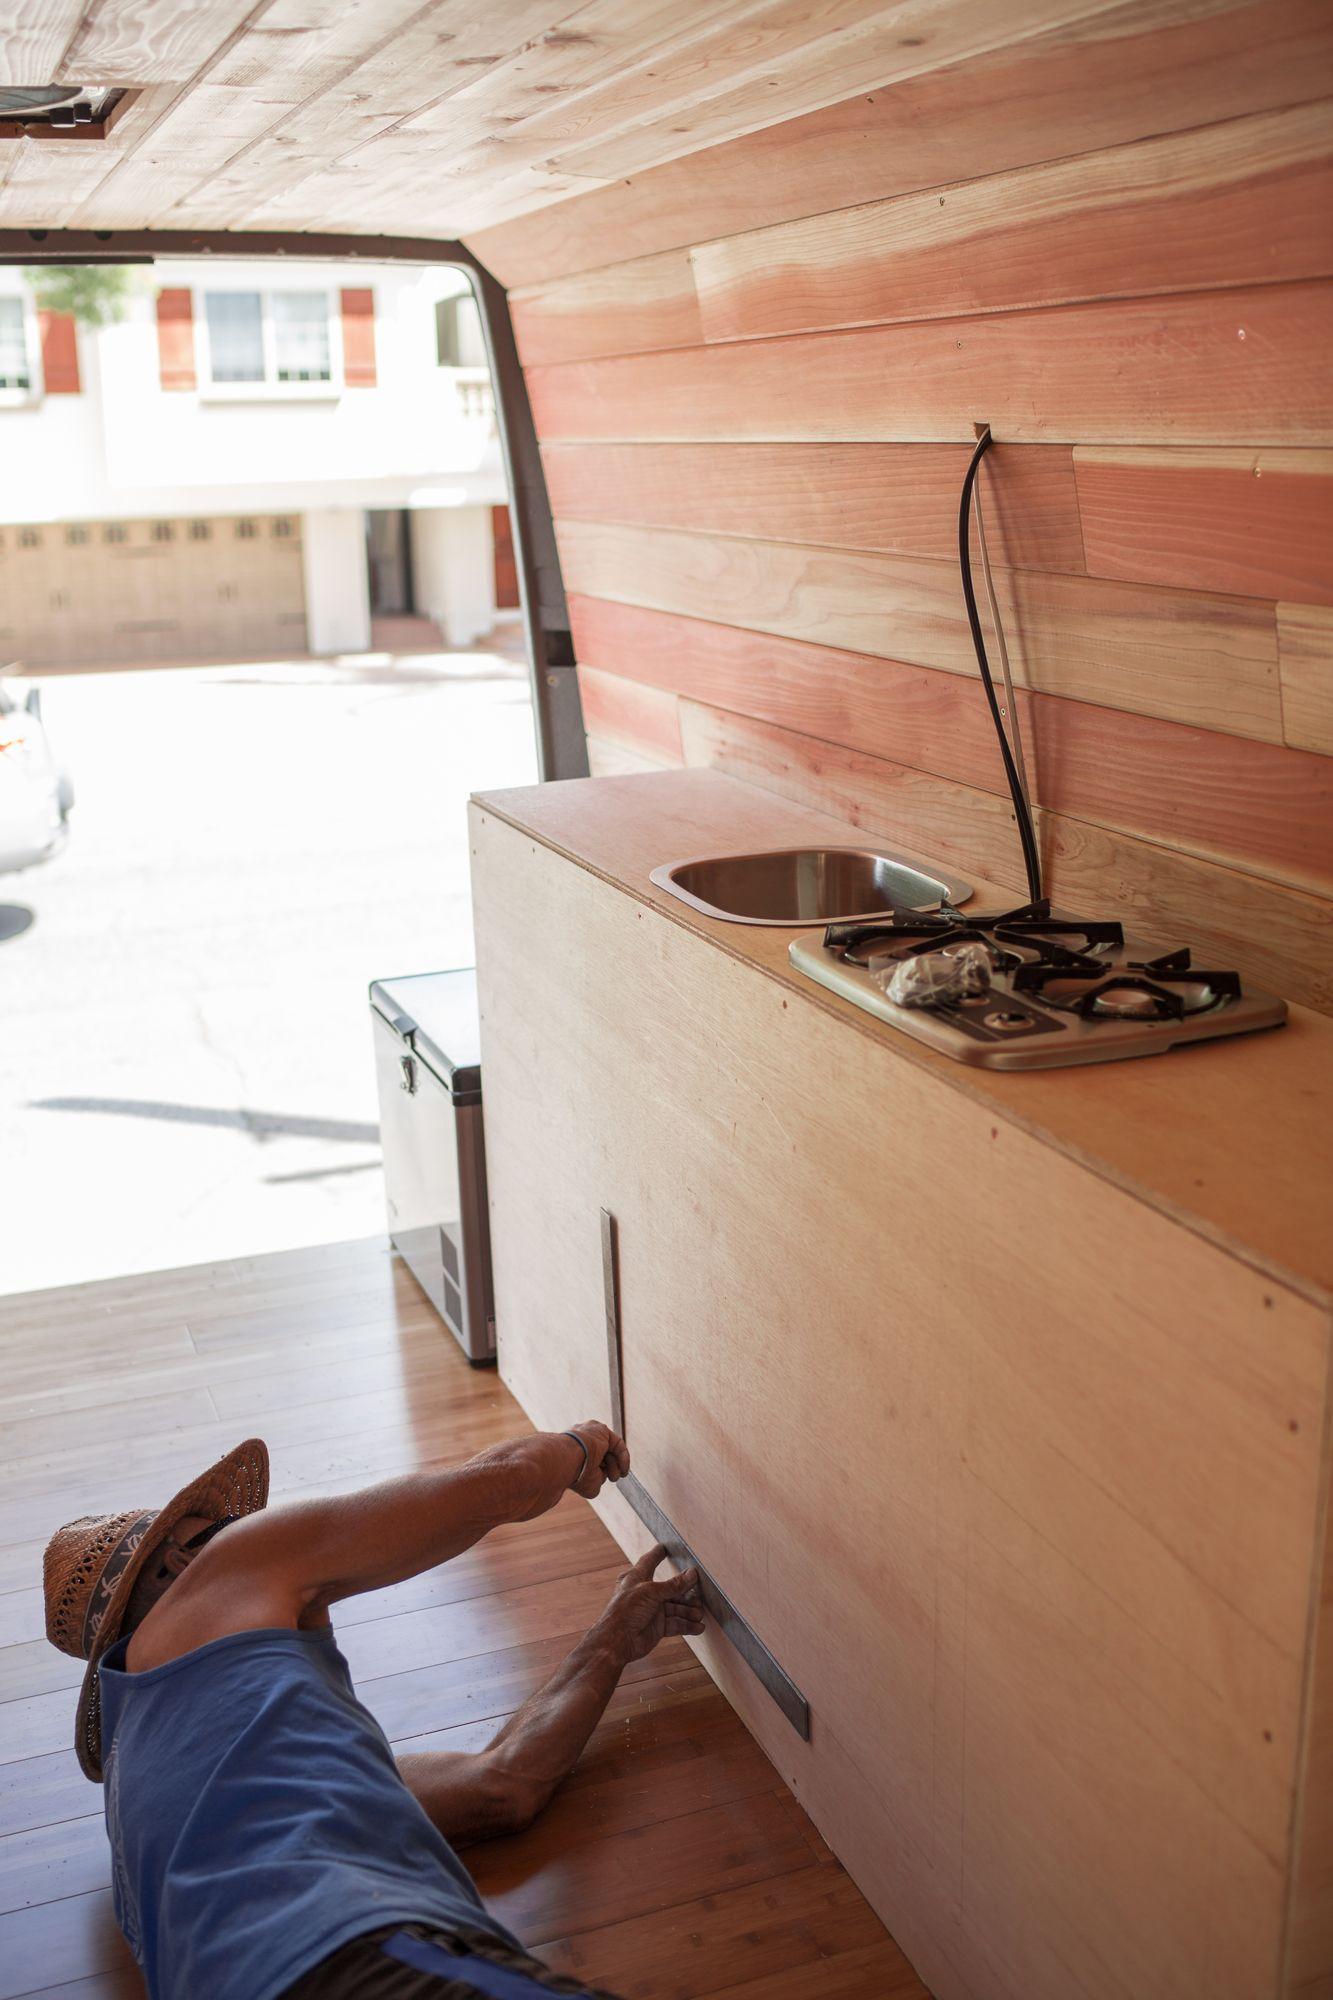 Camper Van Conversions Built In Pump Sink By Cyrus Sutton VanConversion